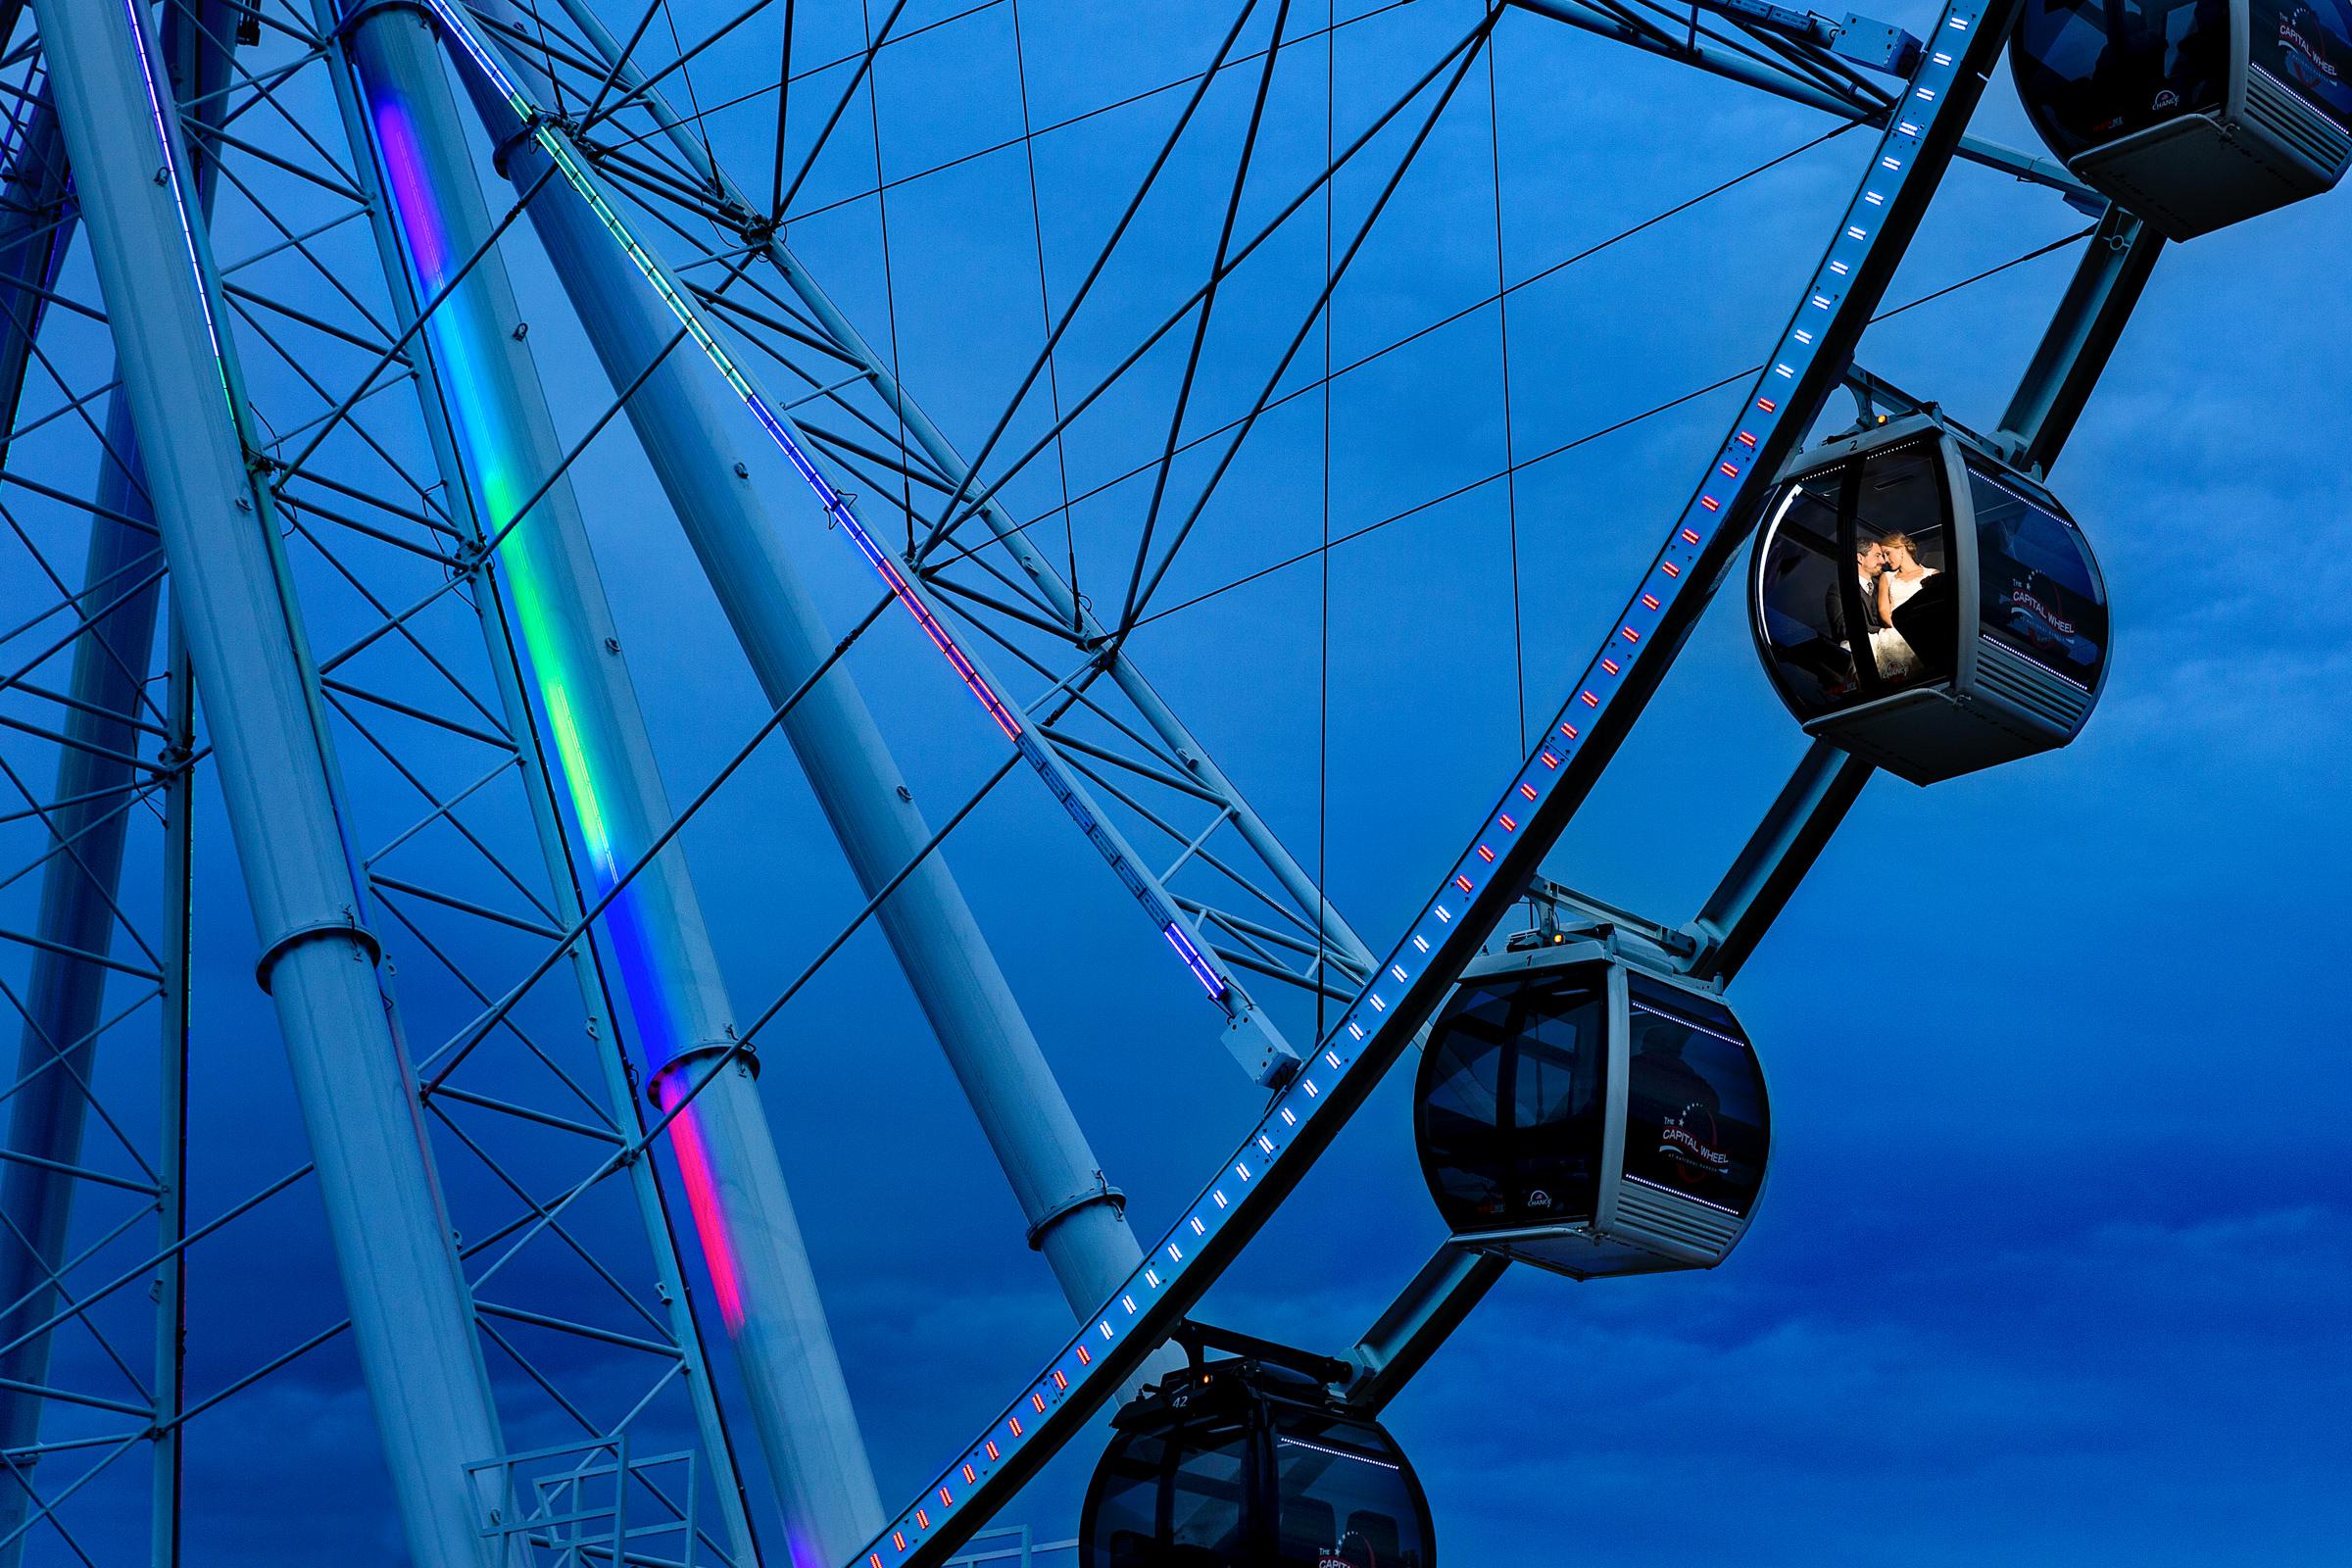 Couple on Ferris wheel - best wedding portraits of the decade - Procopio Photography